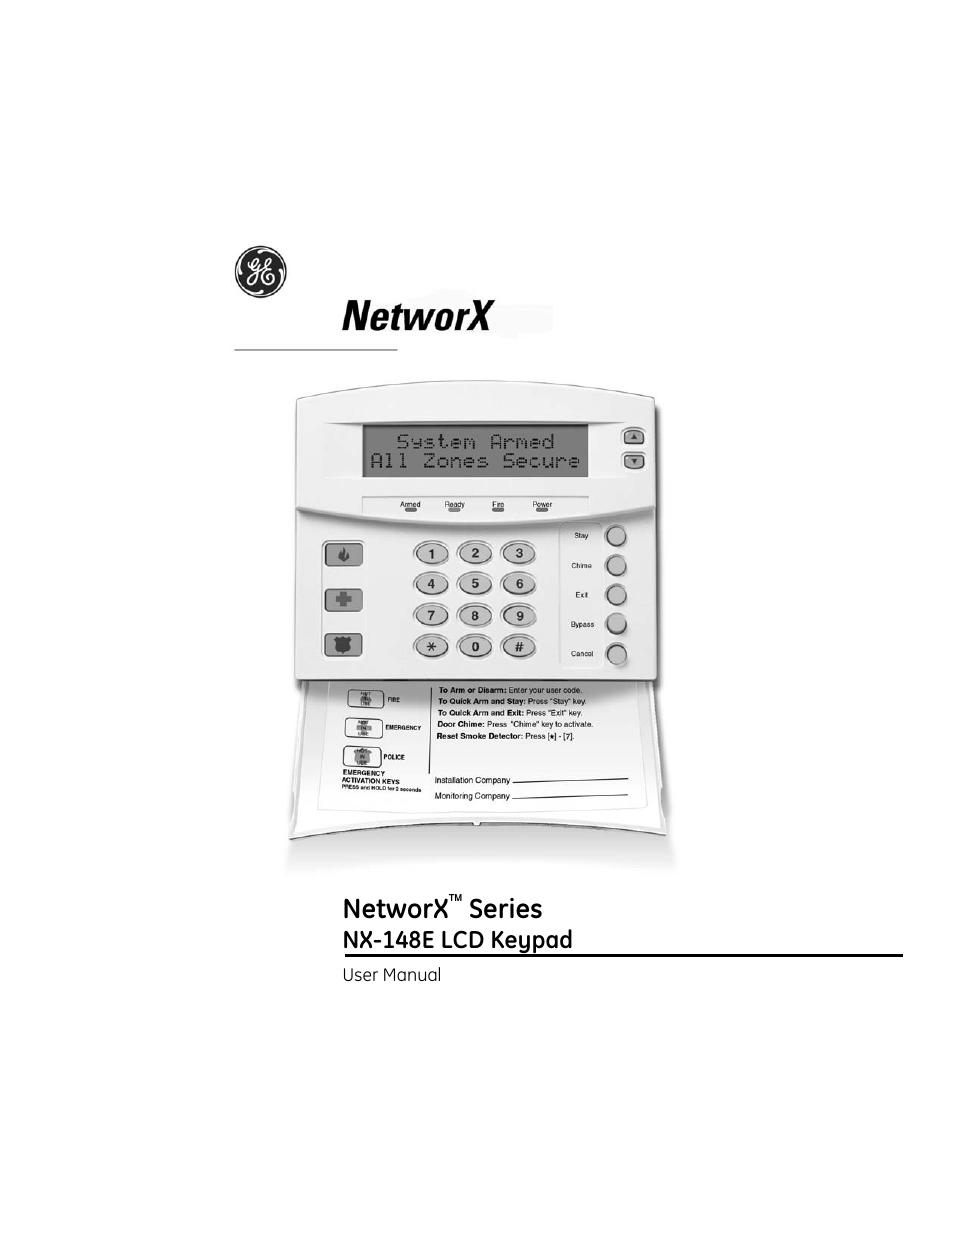 interlogix nx 148e user manual 30 pages rh manualsdir com ge networx nx-8e manual ge networx nx-8e-cf manual